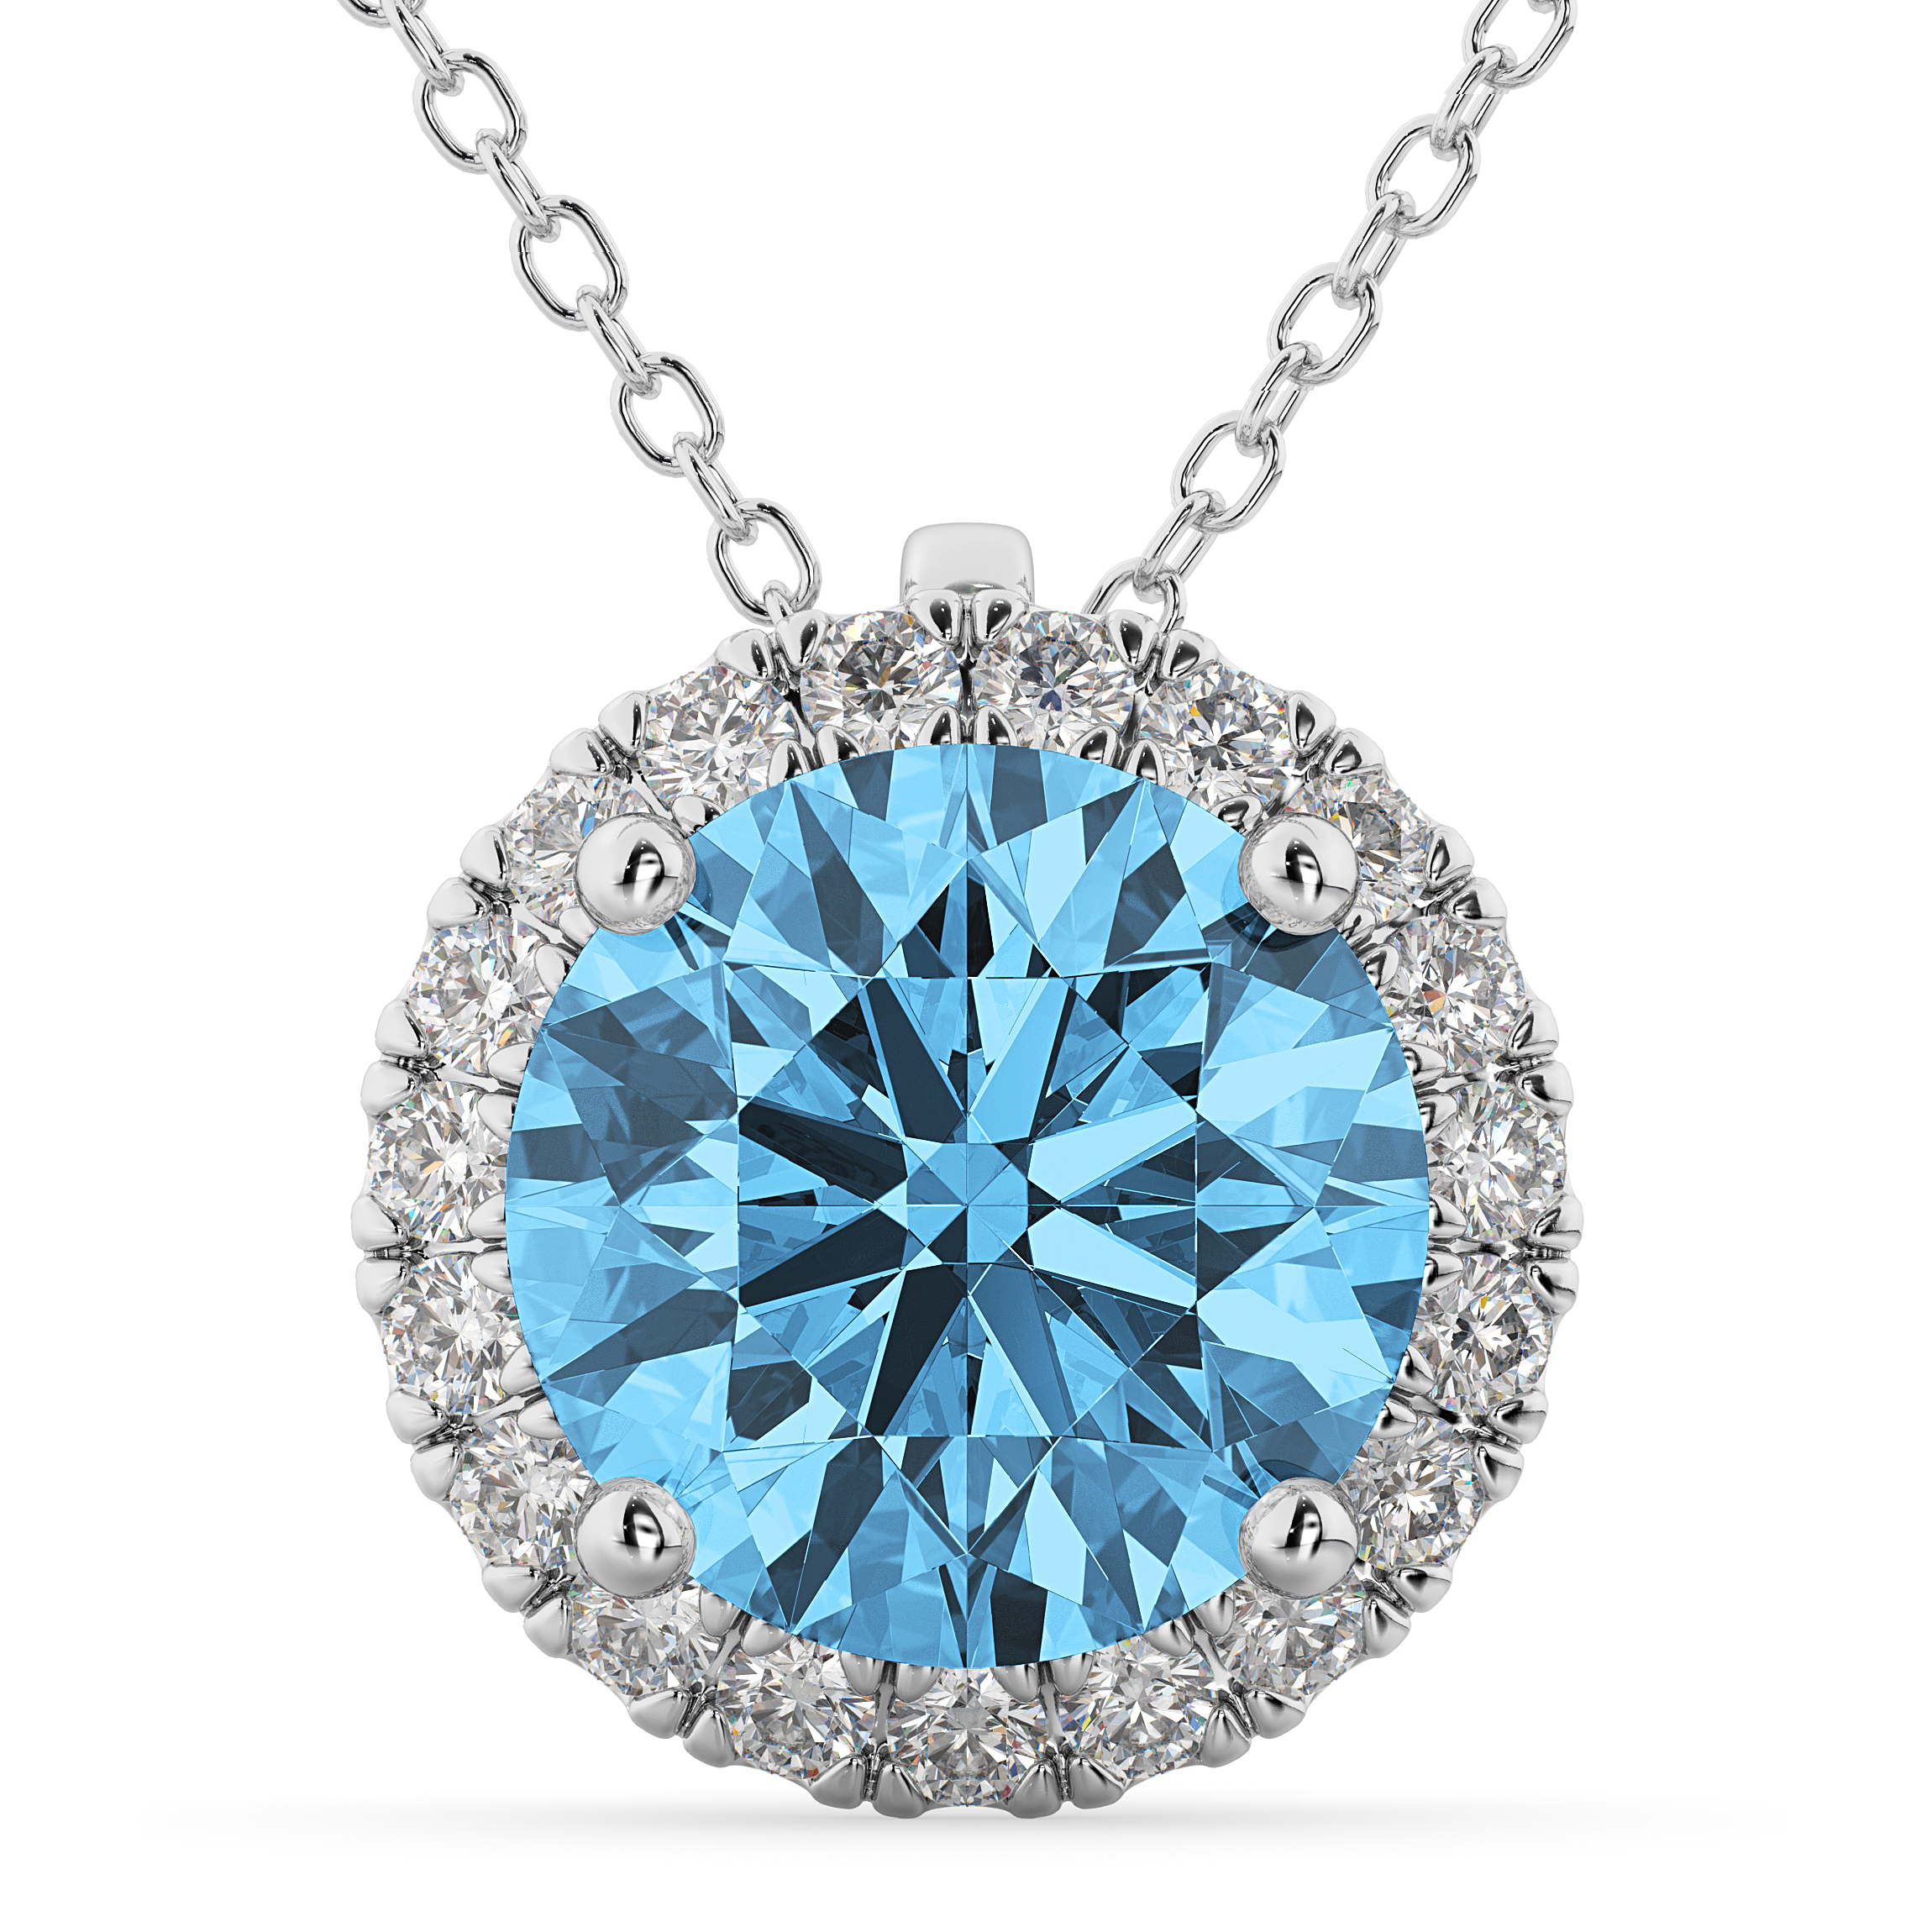 halo round blue topaz diamond pendant necklace 14k white. Black Bedroom Furniture Sets. Home Design Ideas